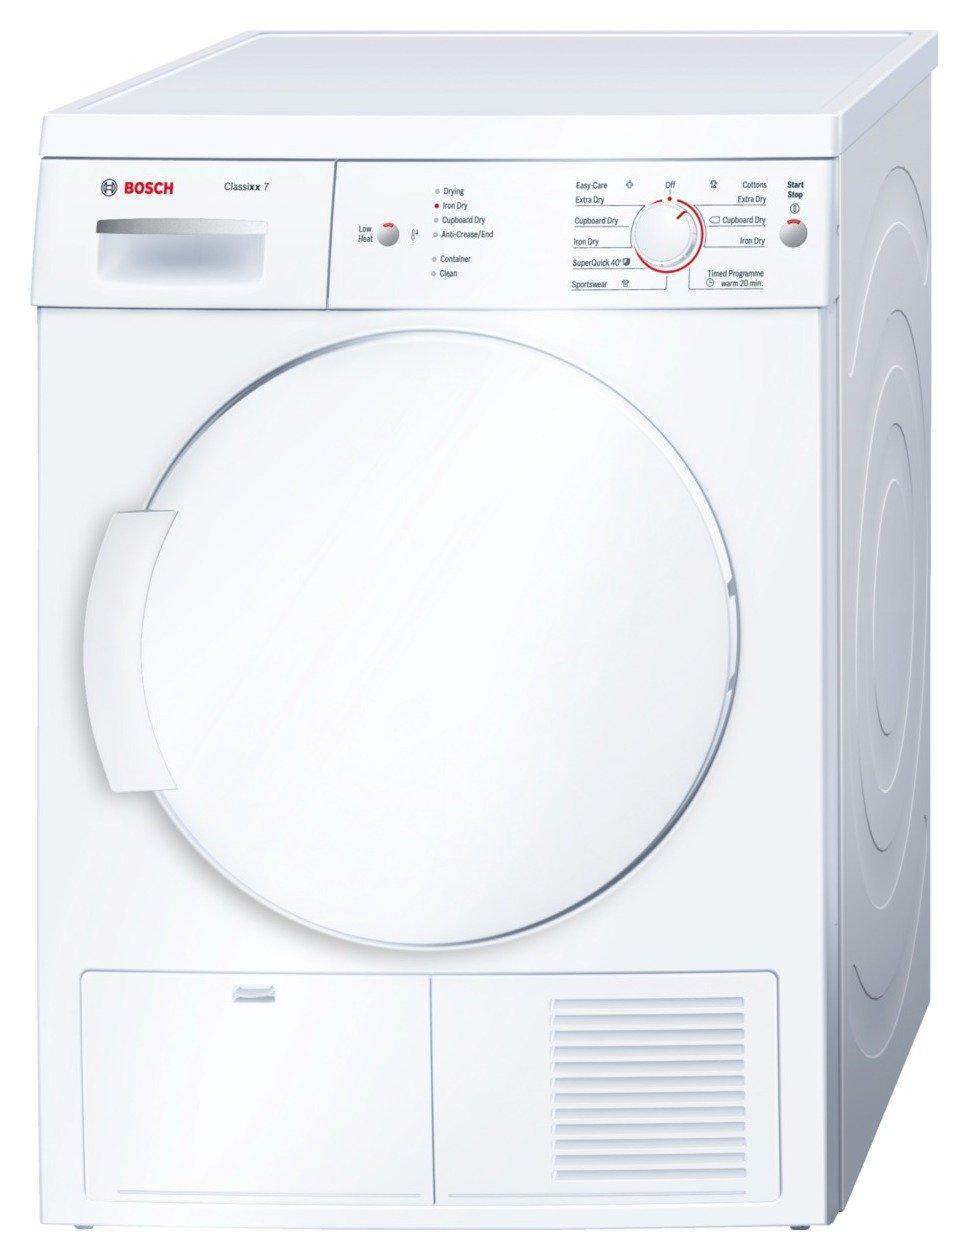 Bosch - WTE84106GB Condenser - Tumble Dryer - White